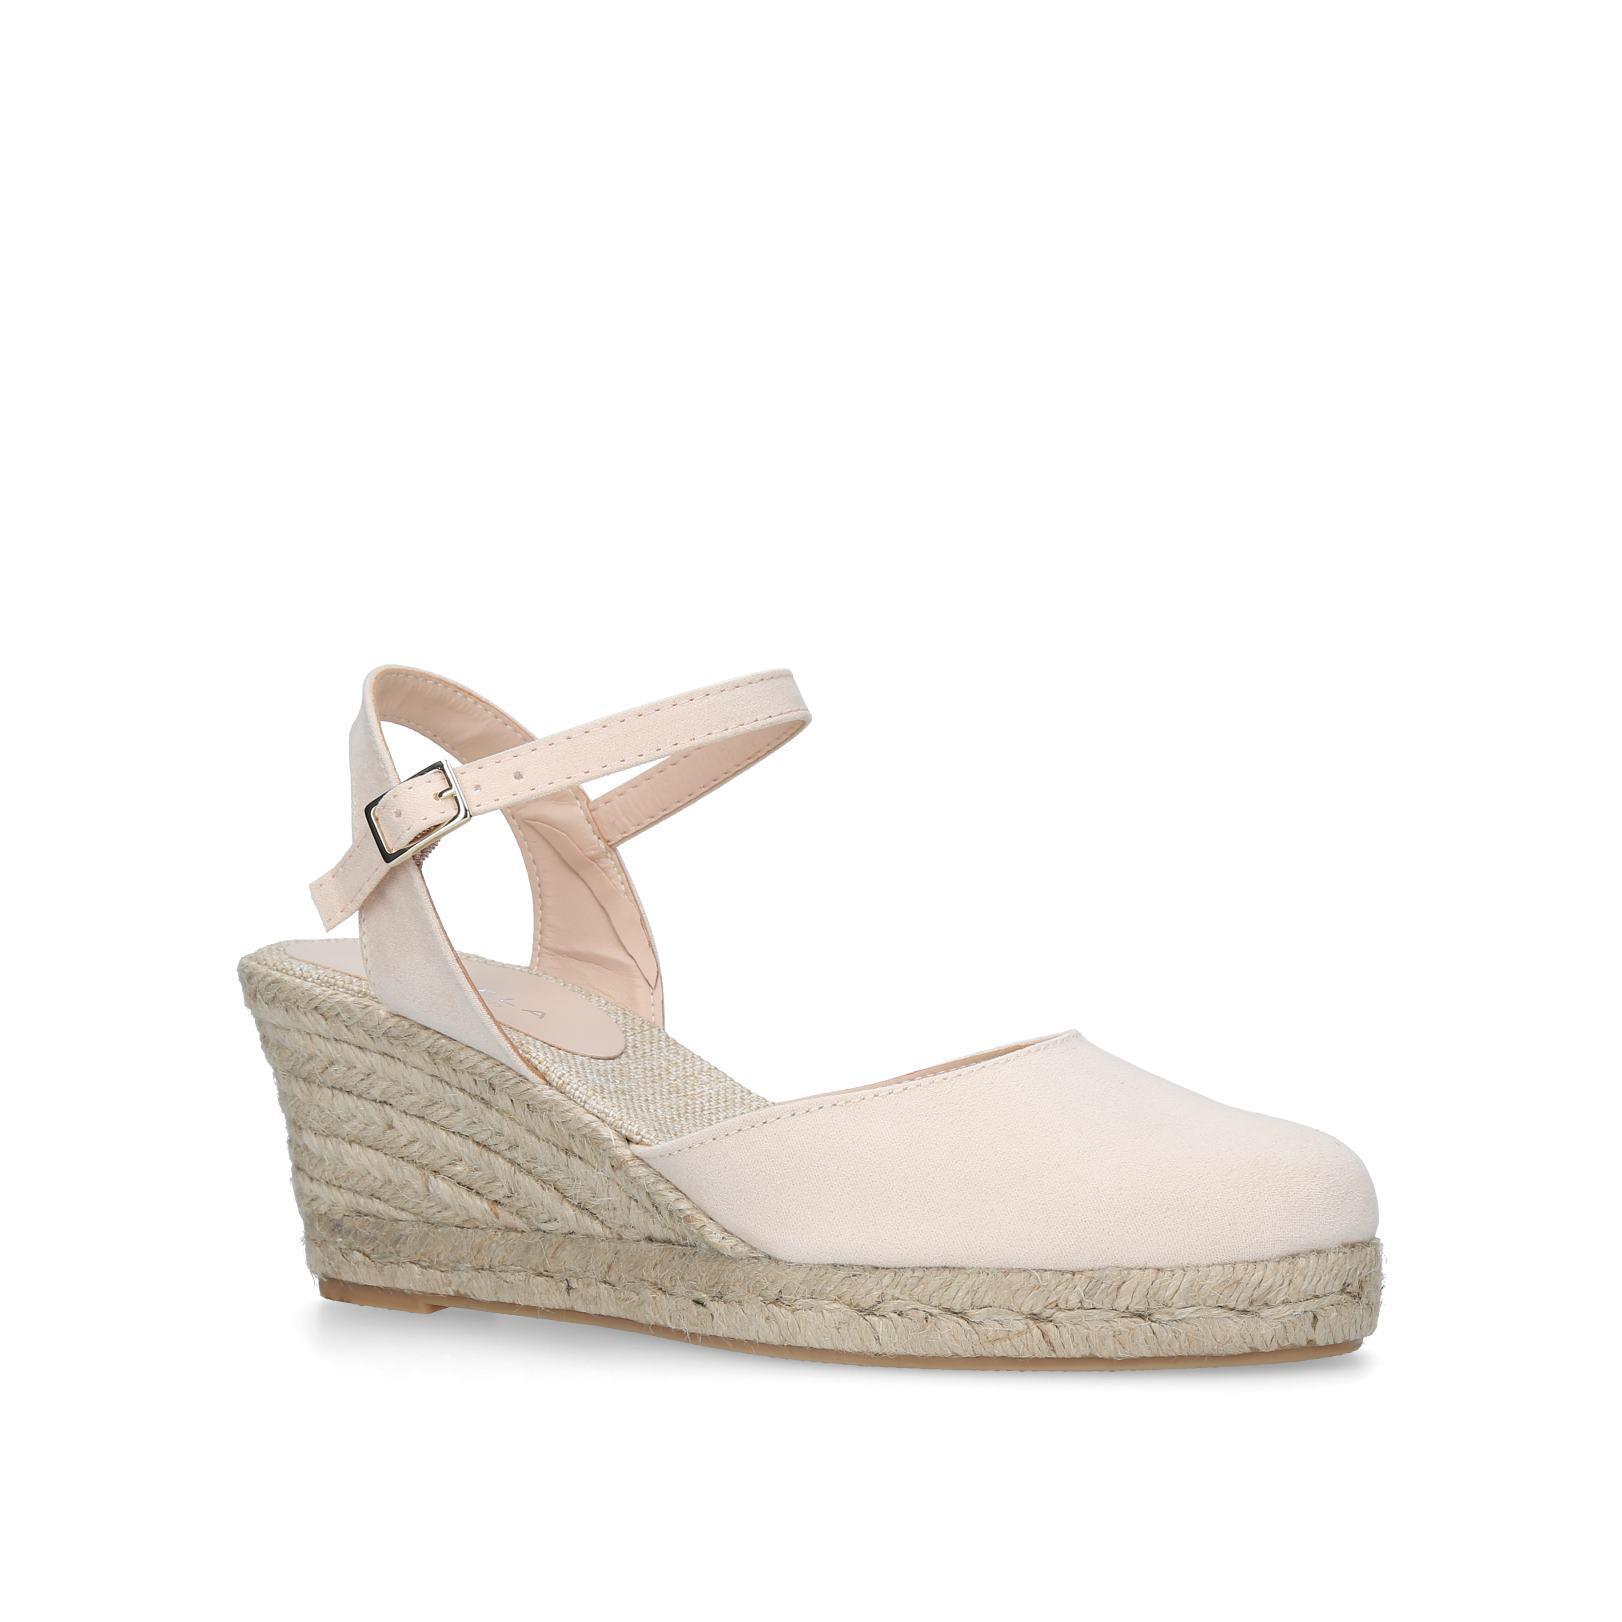 168203912a5 Sabrina 2 Espadrille Wedge Sandals